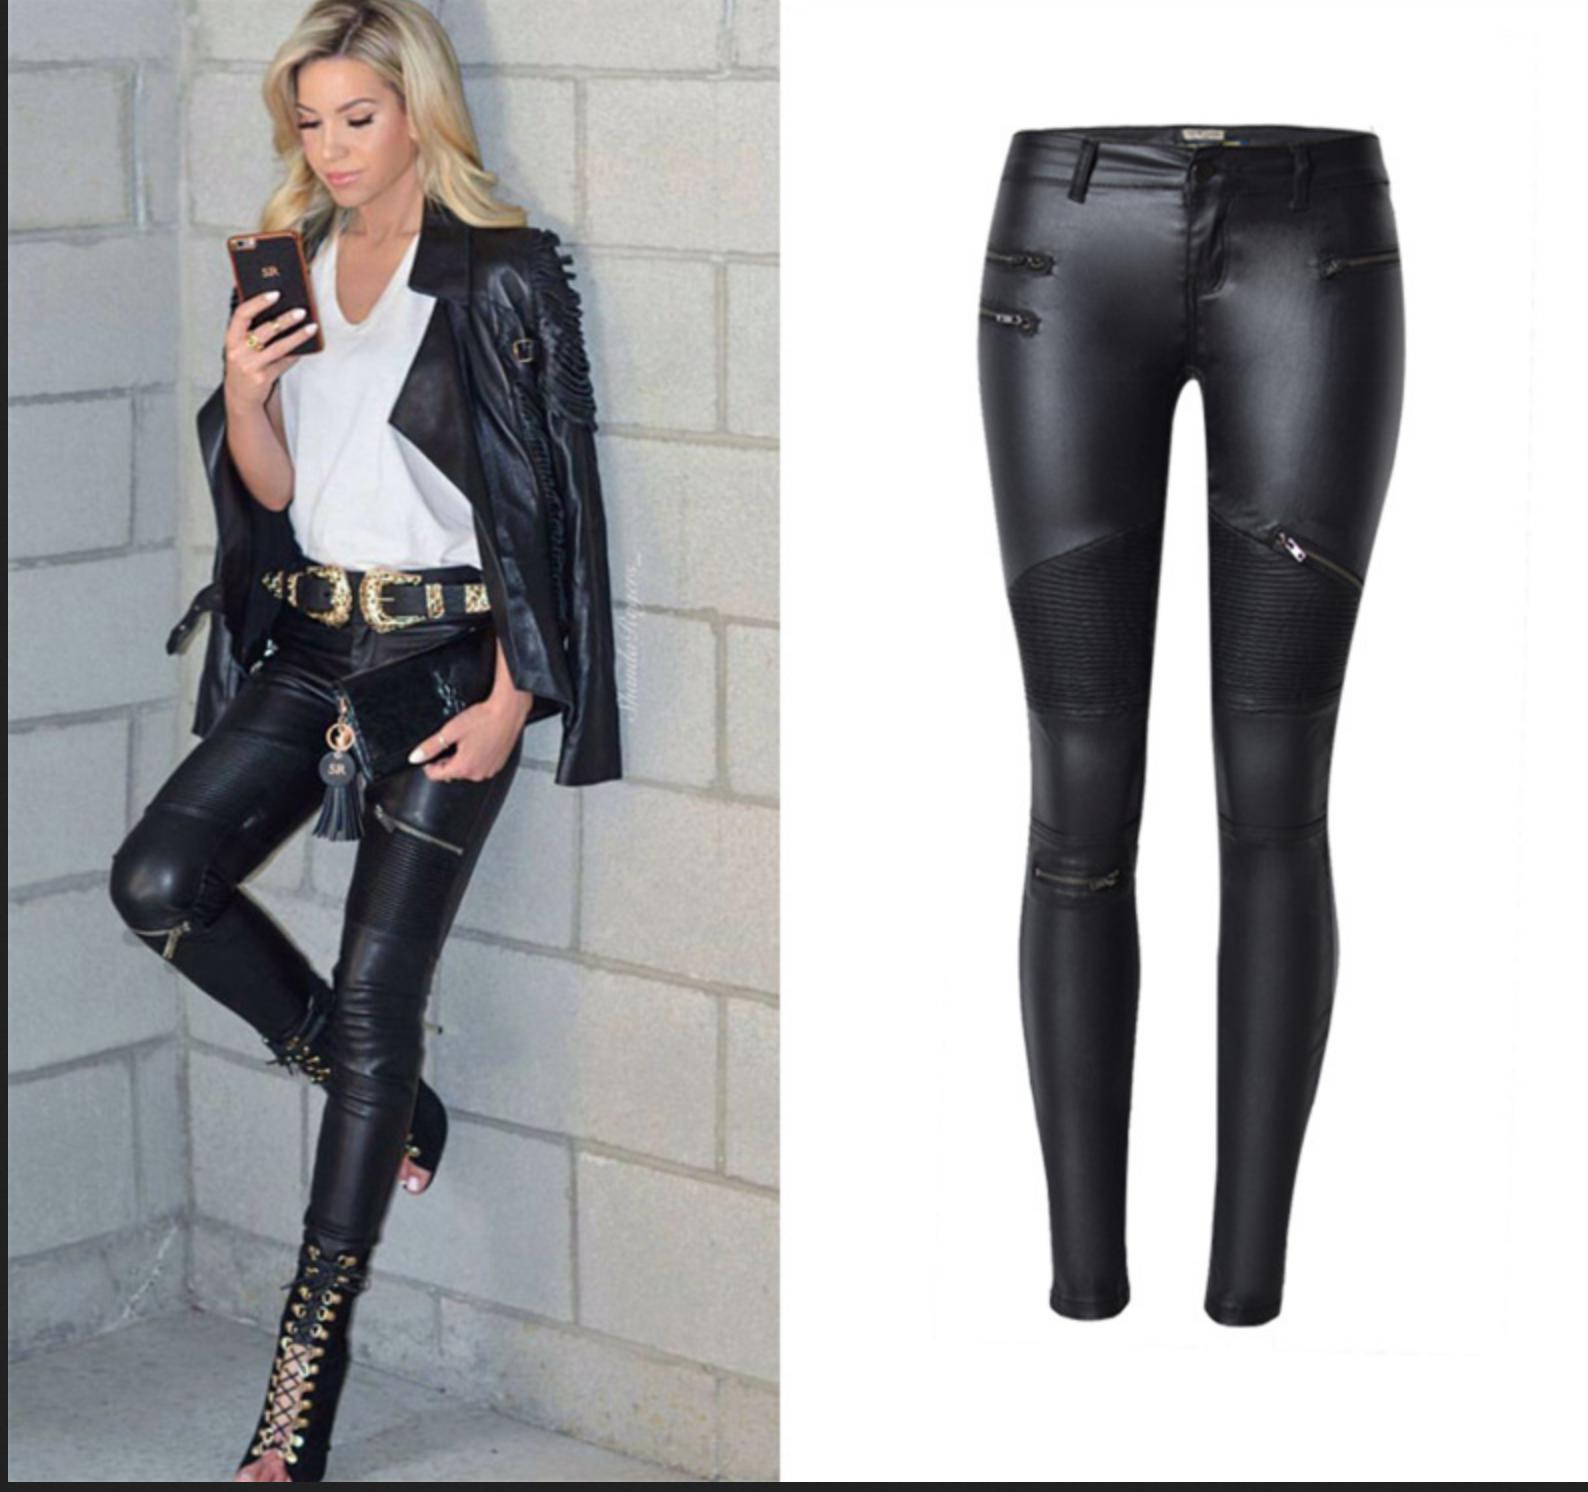 Legging pantalon style cuir boho bohème chic pants0244